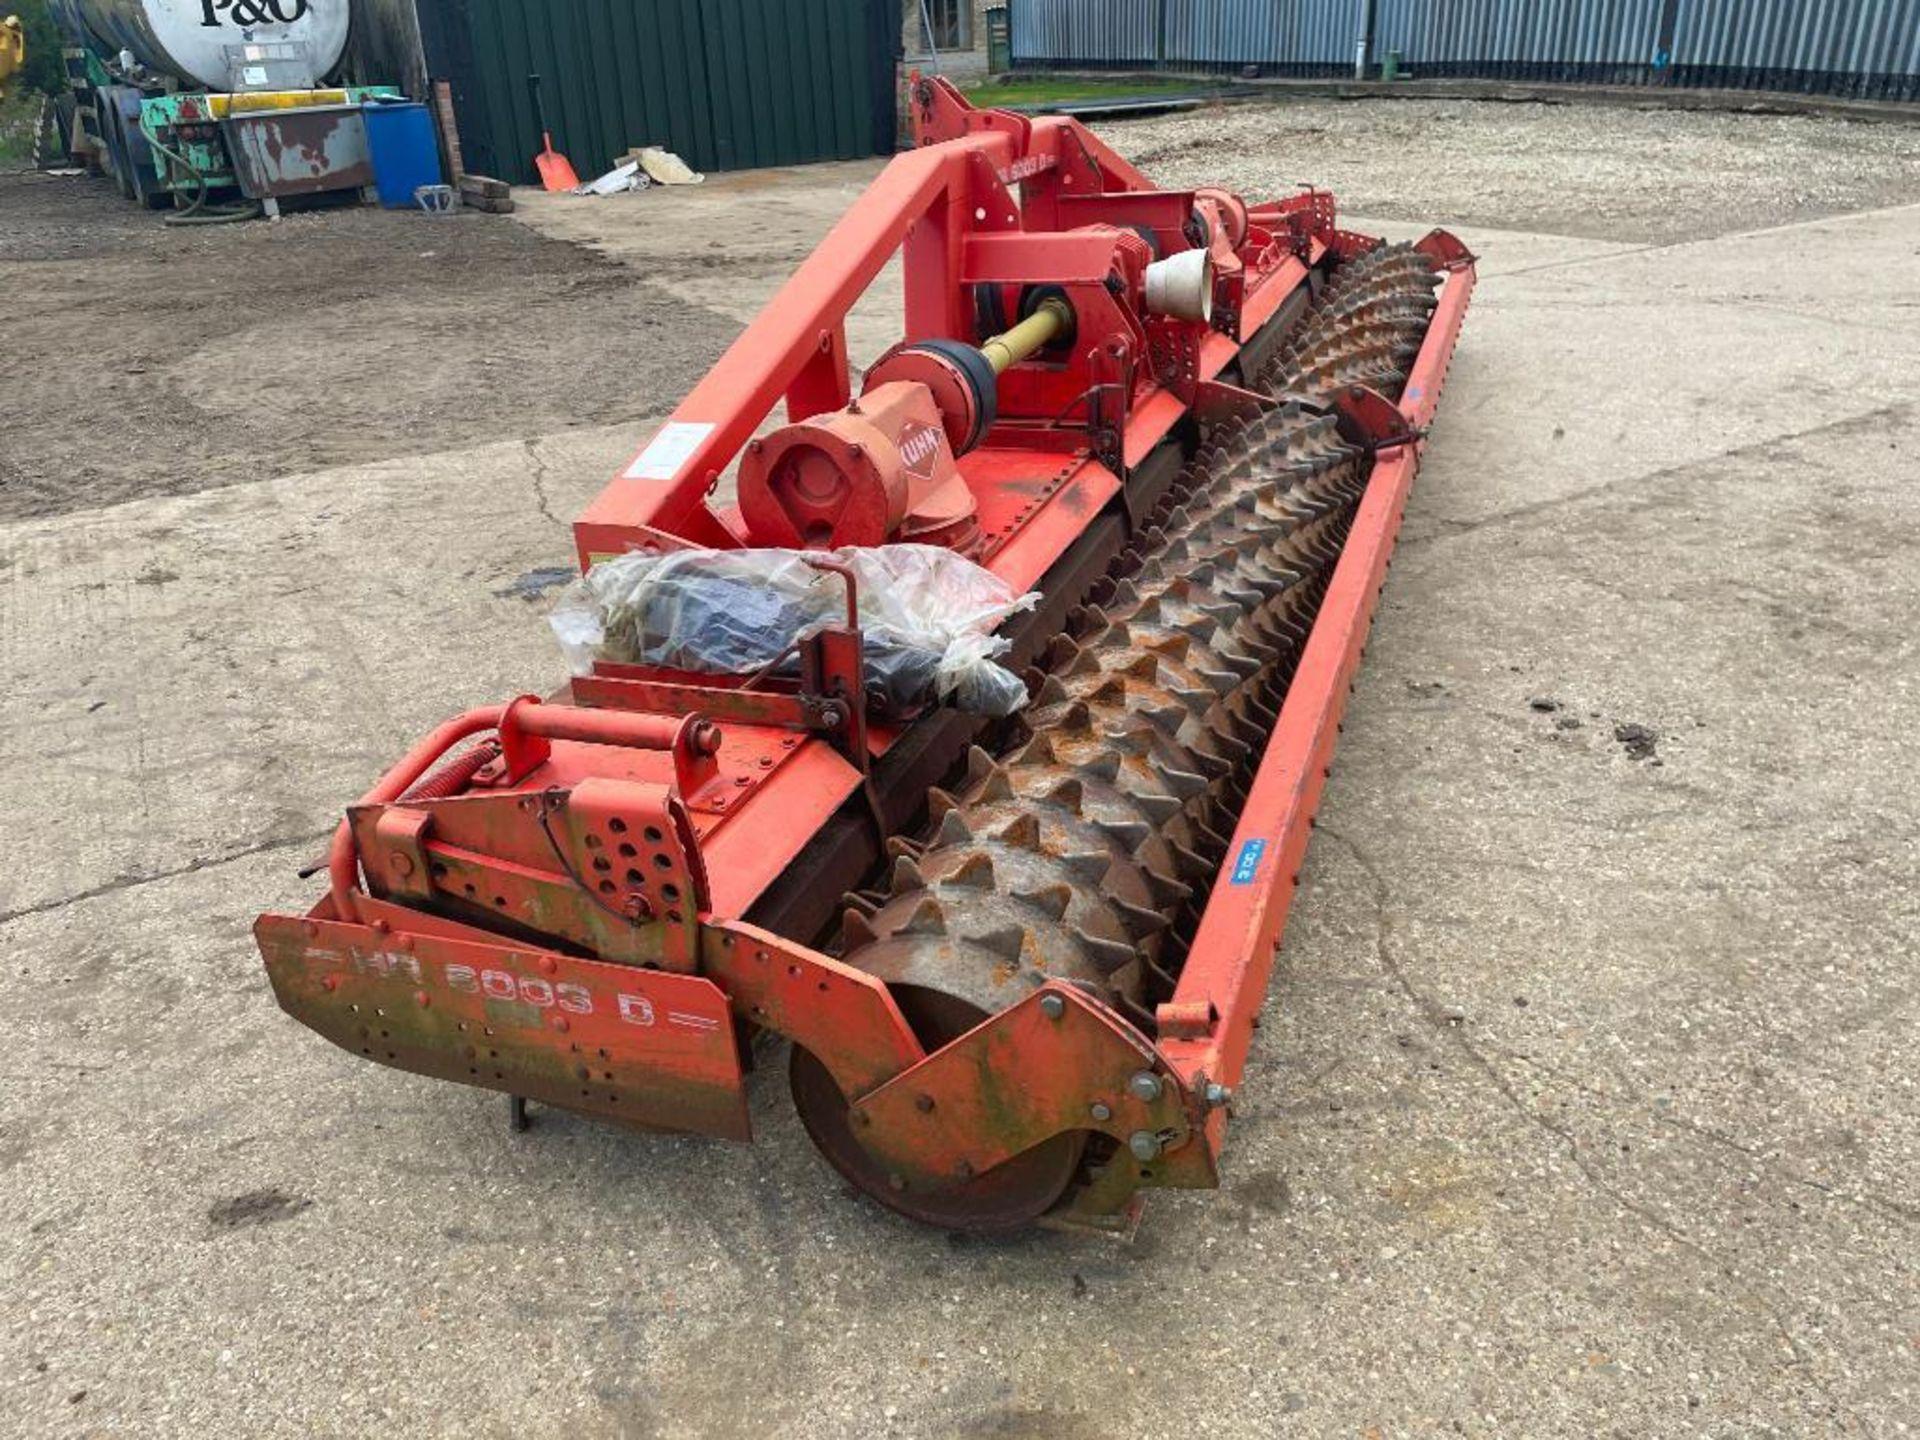 2000 Kuhn HR6003D 6m fixed power harrow and rear crumbler, PTO driven. Serial No: A0452 NB: Manual i - Image 12 of 19